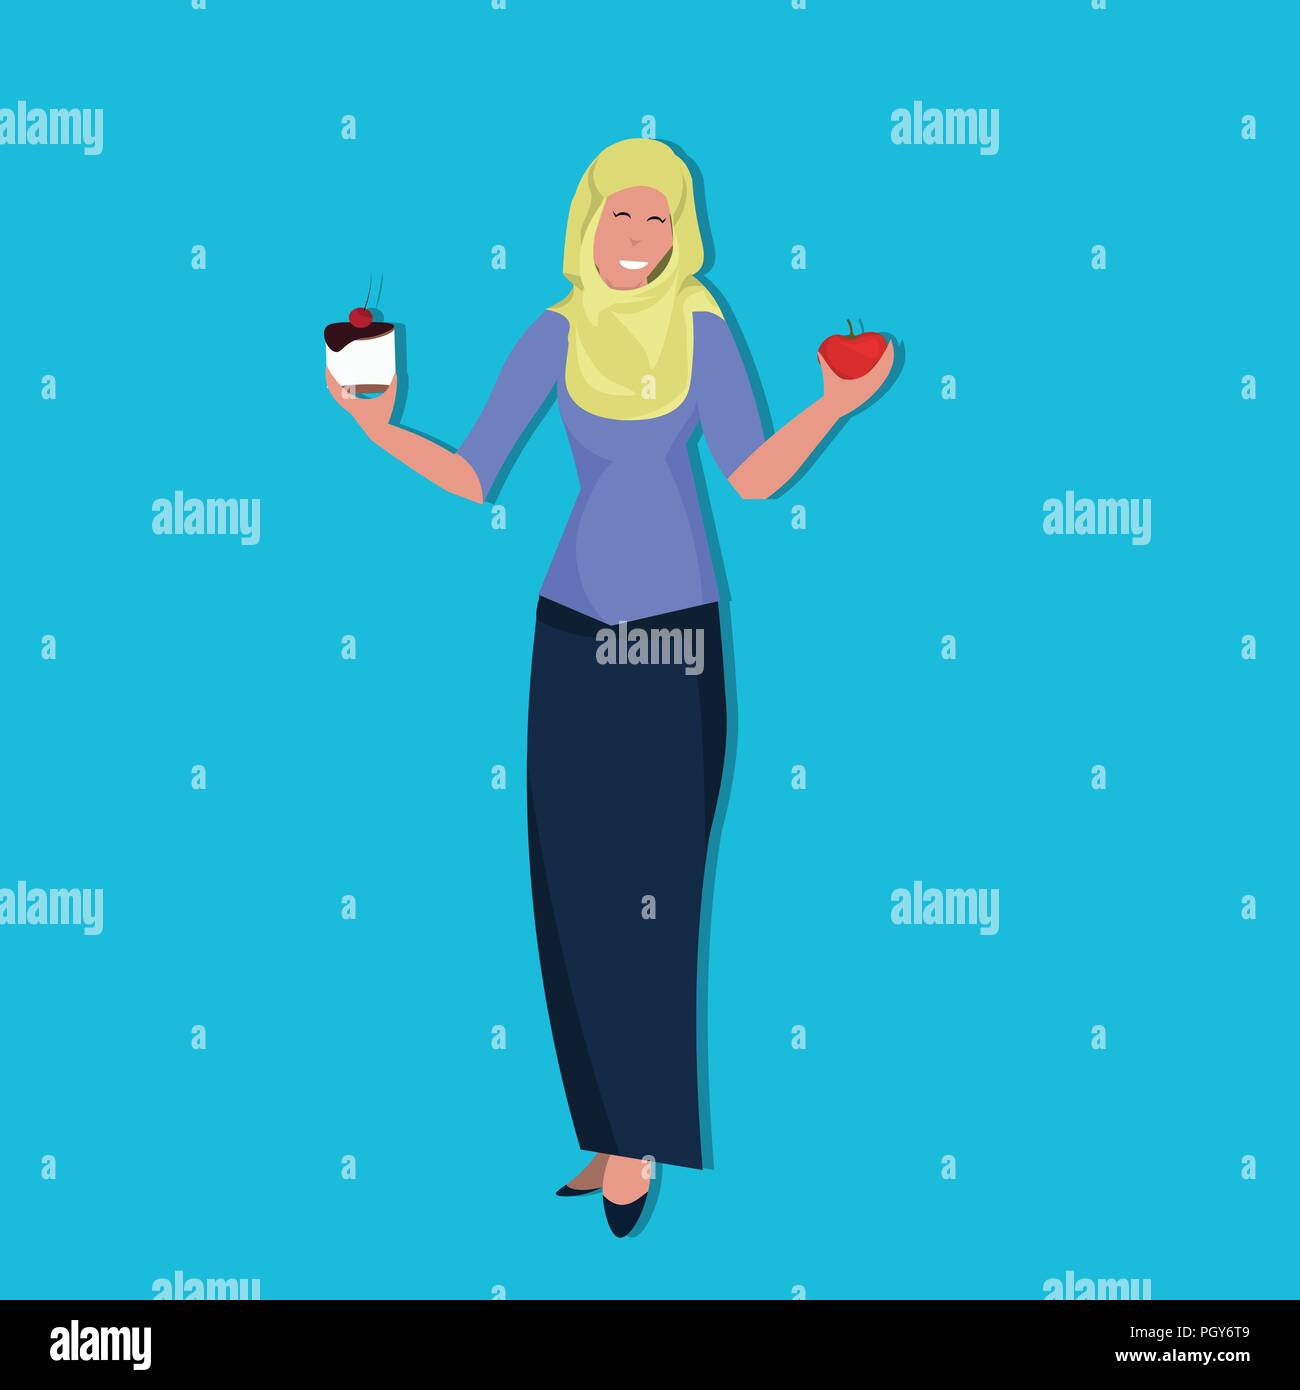 arabic woman holding cake apple resist temptation making